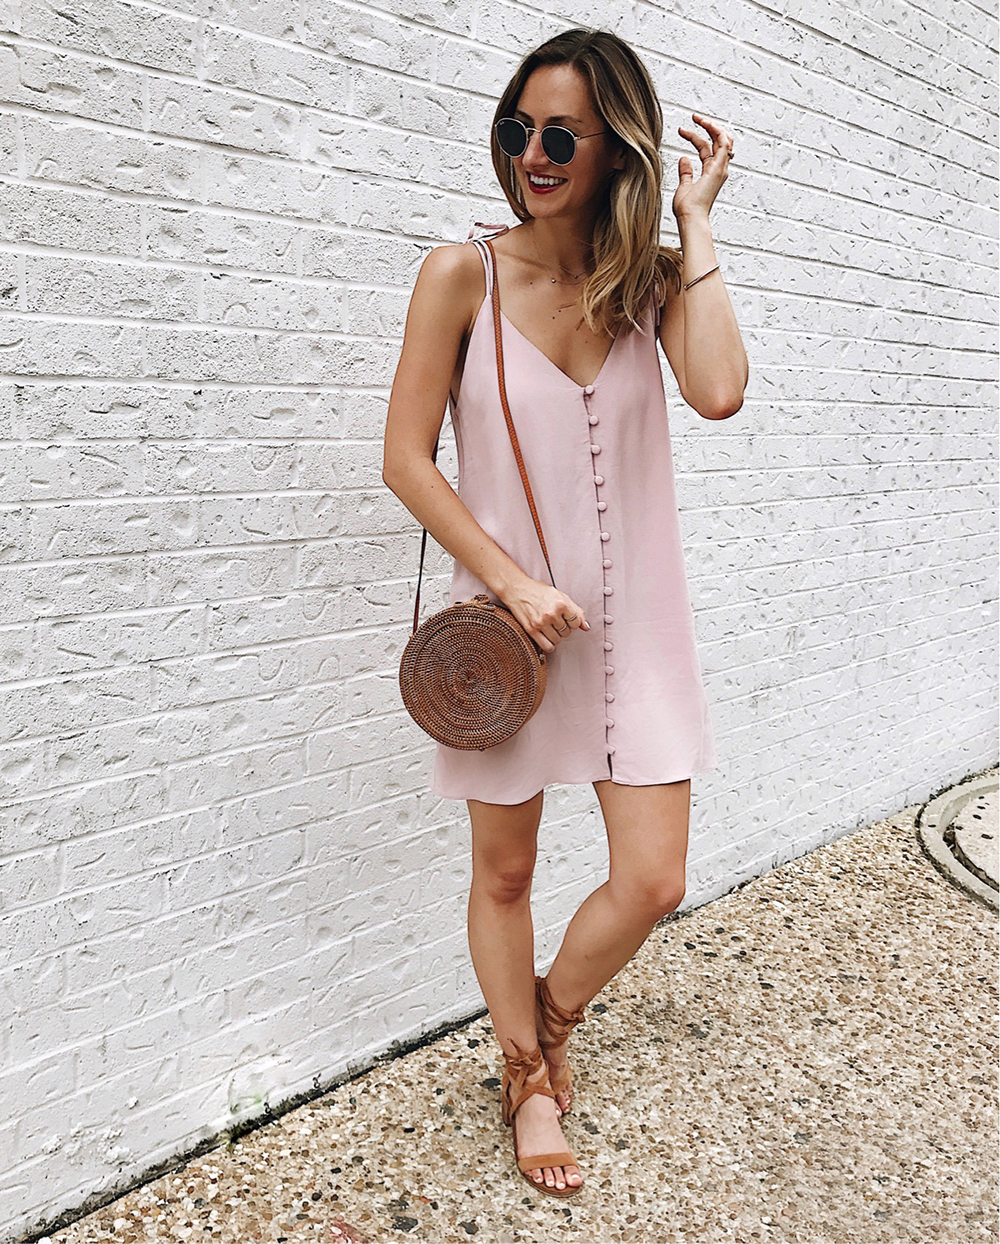 Instagram Roundup June 19 2017 Livvyland Austin